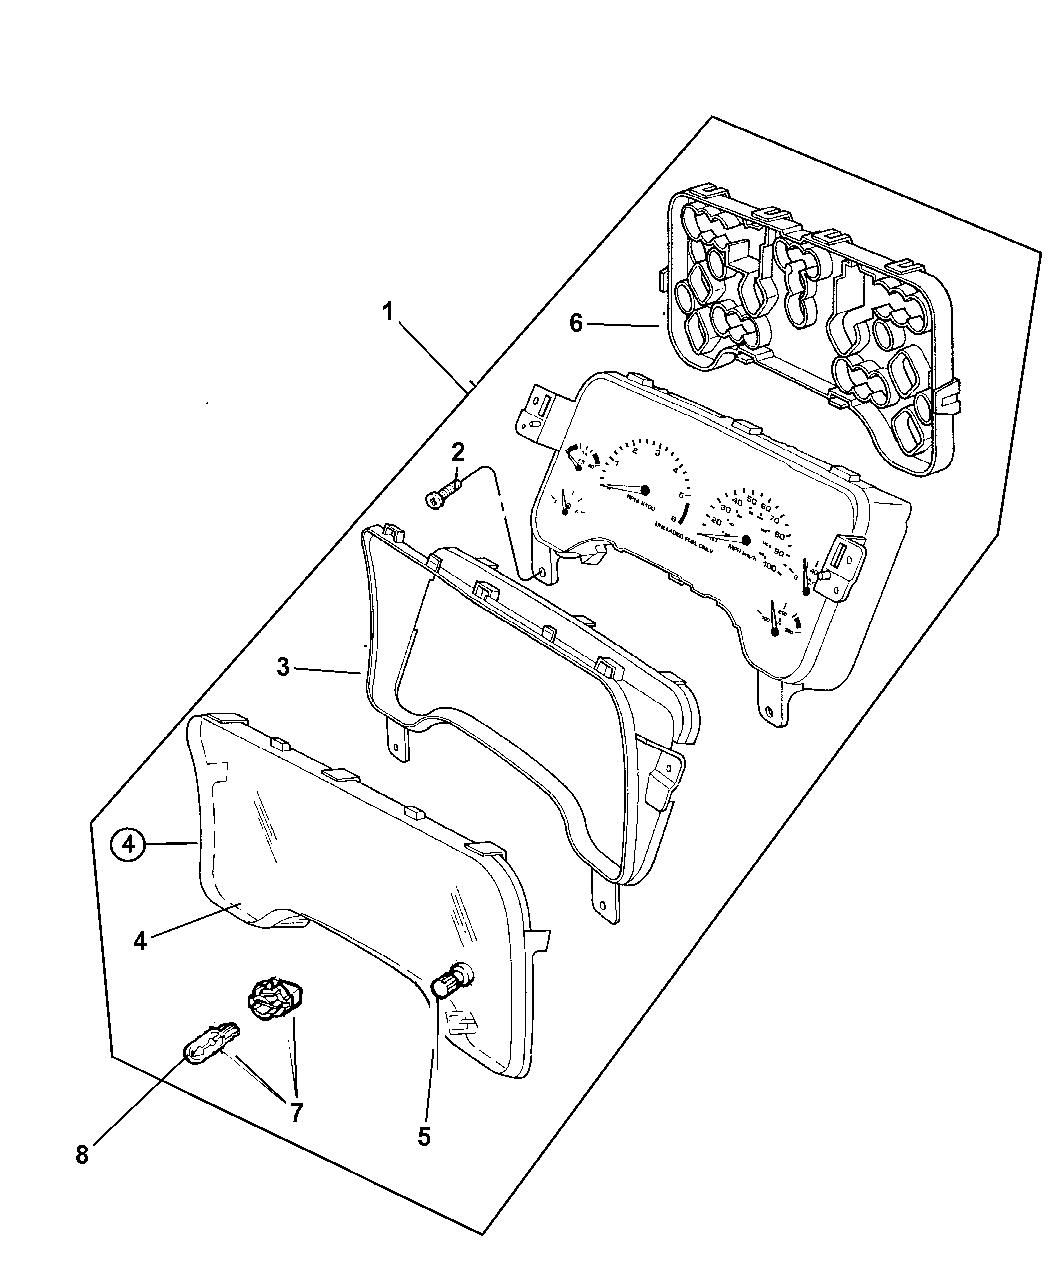 1997 Jeep Wrangler Instrument Cluster - Mopar Parts Giant